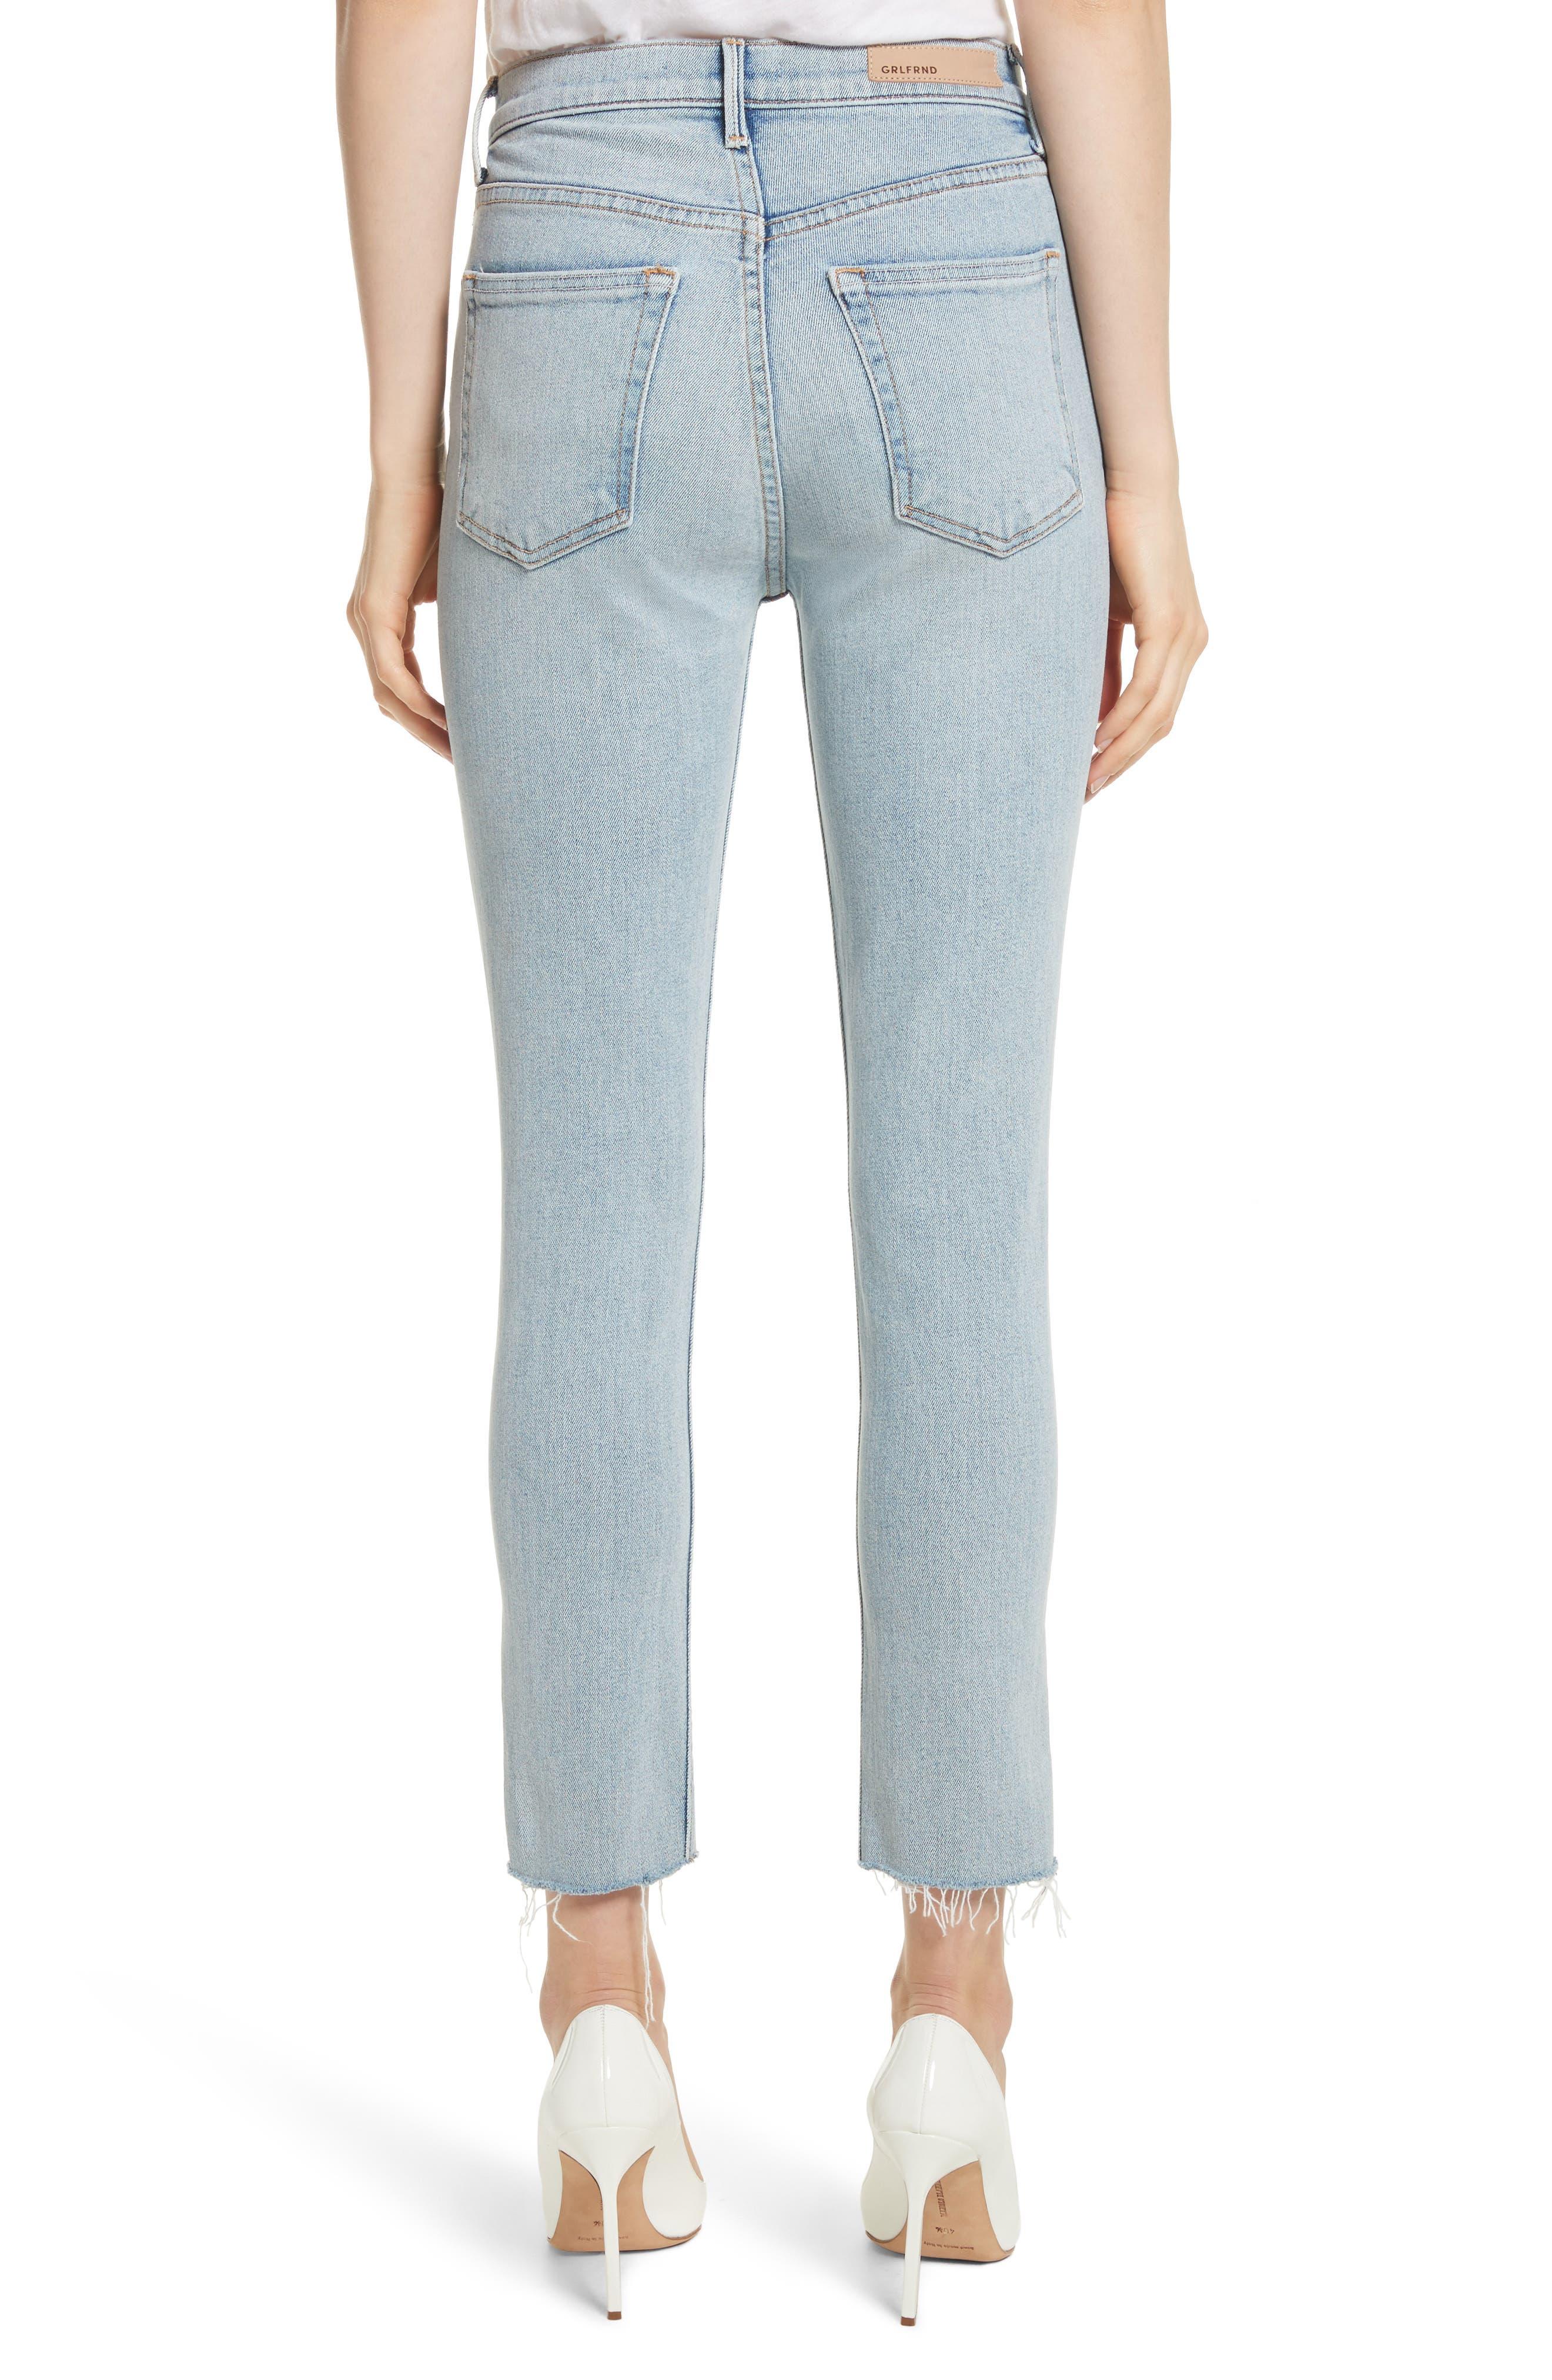 Karolina High Waist Skinny Jeans,                             Alternate thumbnail 2, color,                             TITANIUM